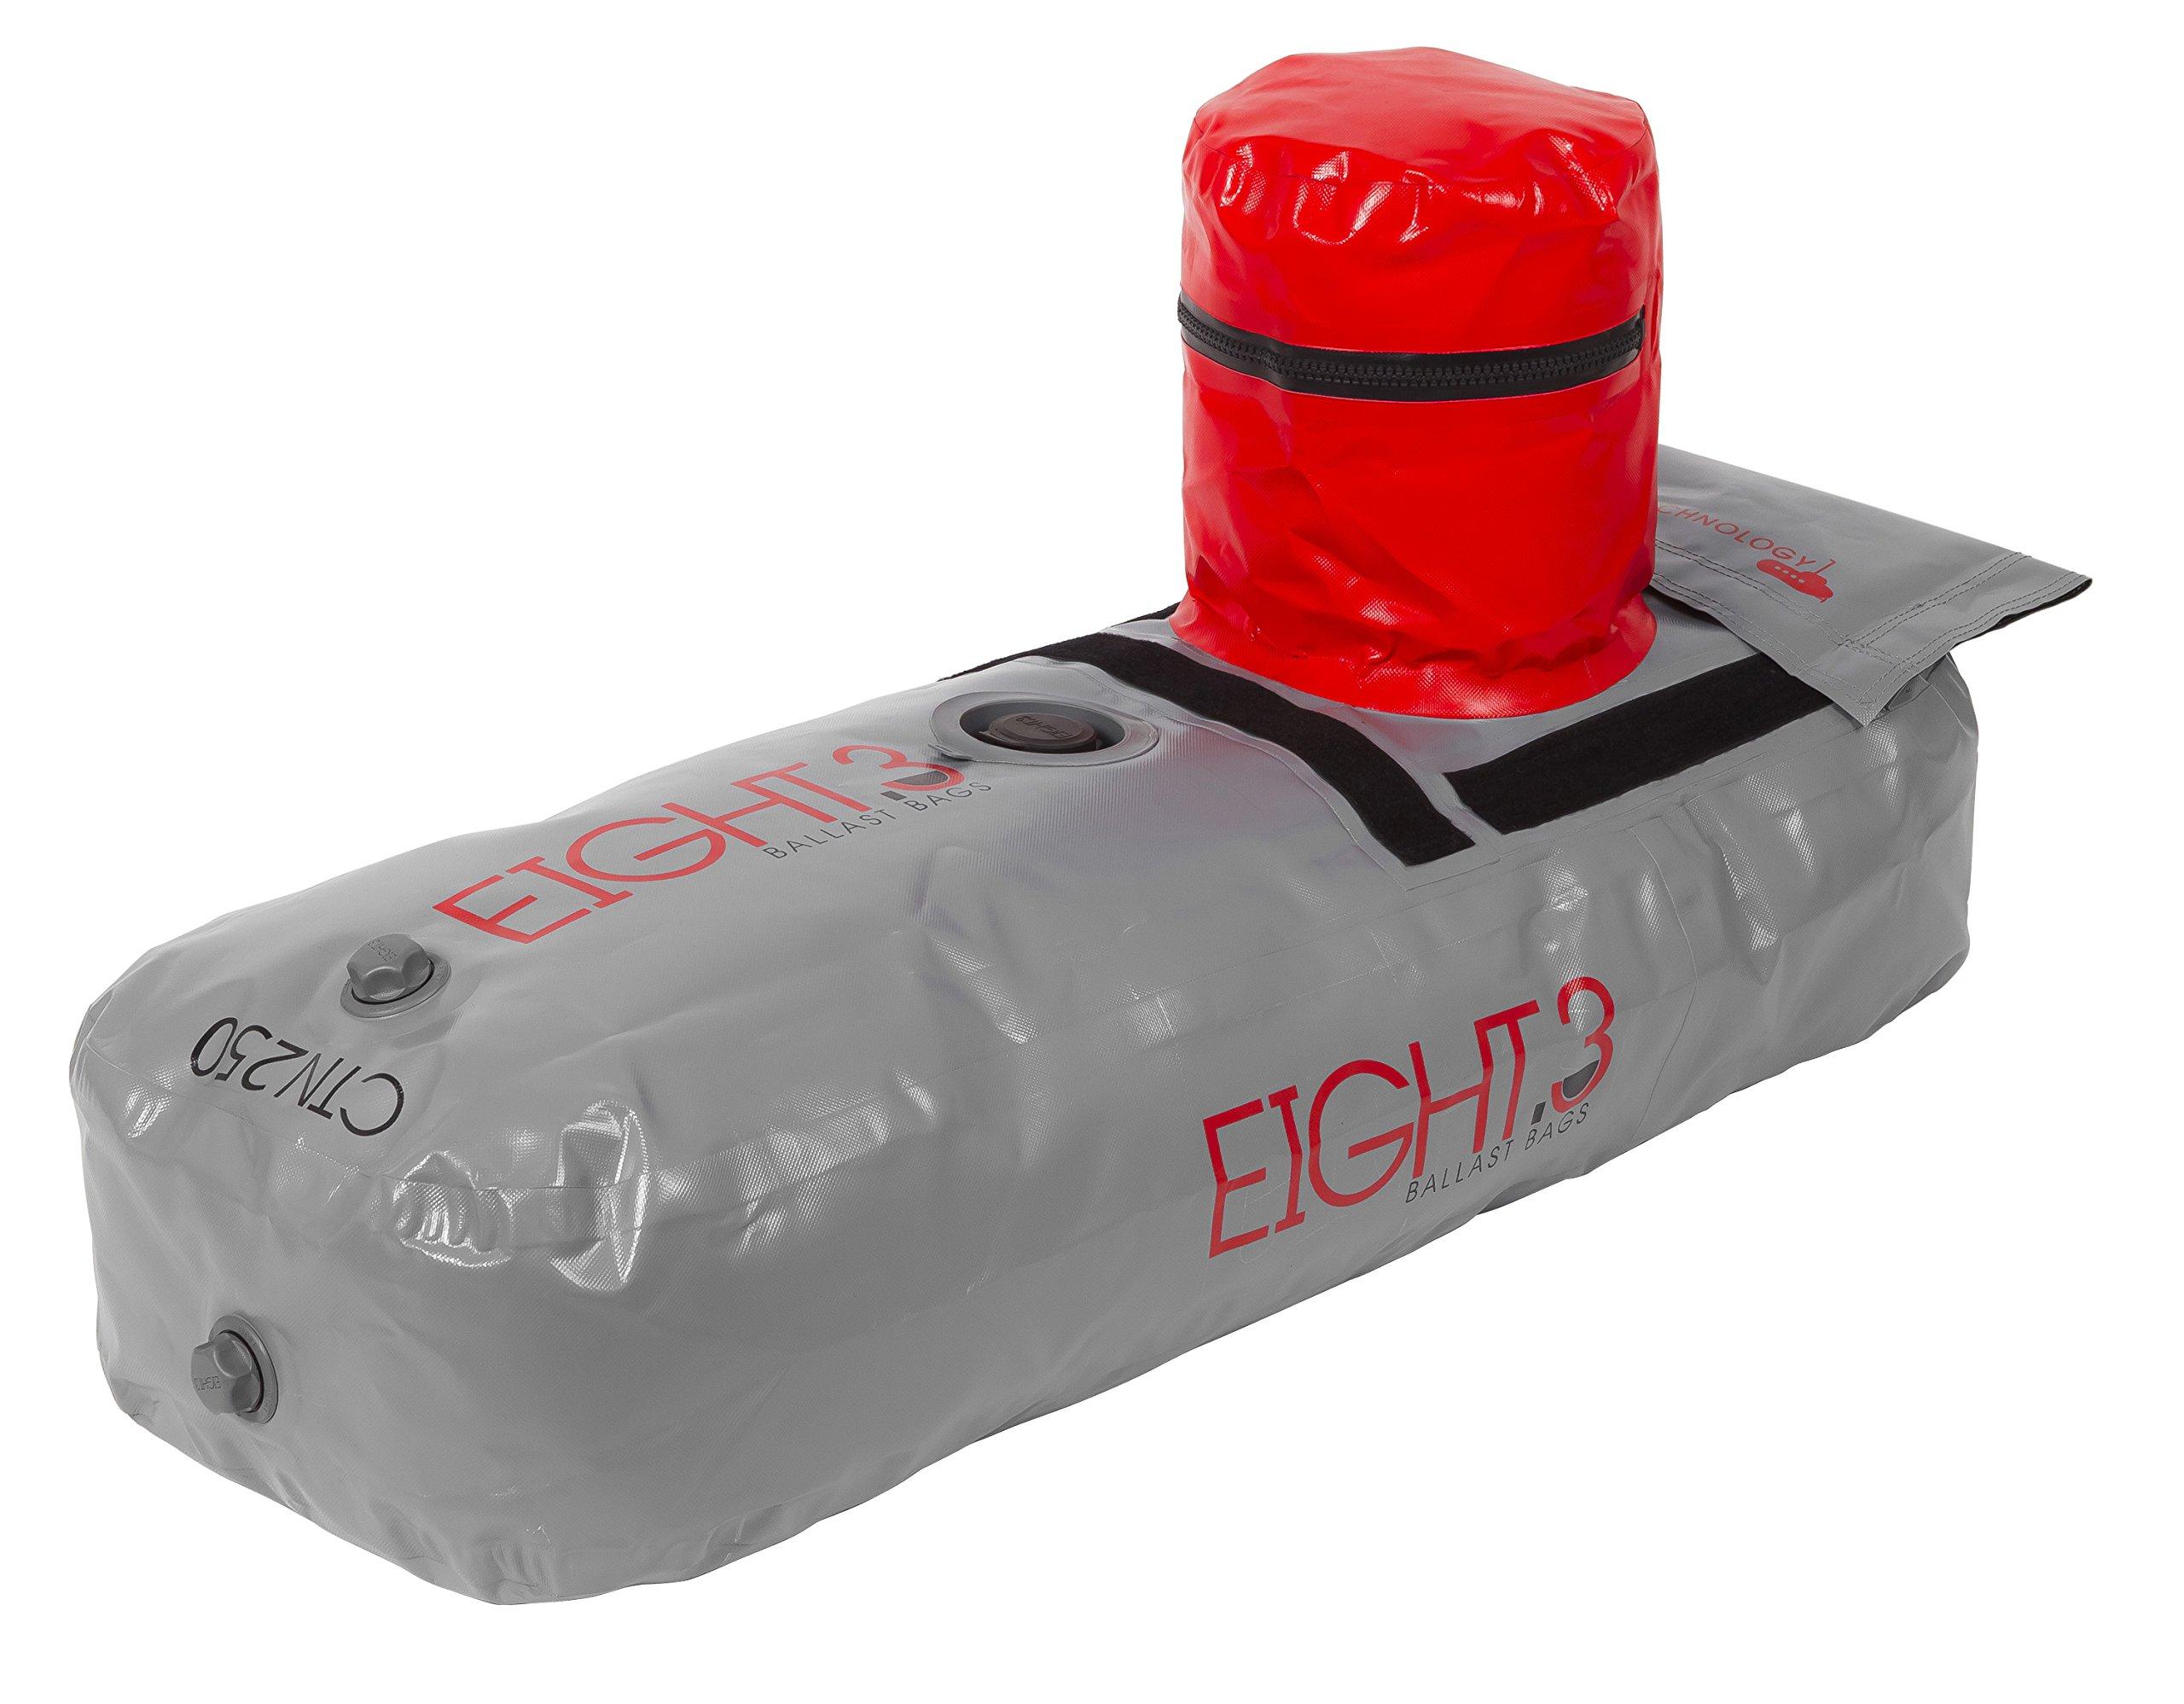 Eight.3 Telescope Locker/Seat Ballast Bag Sz 360lbs